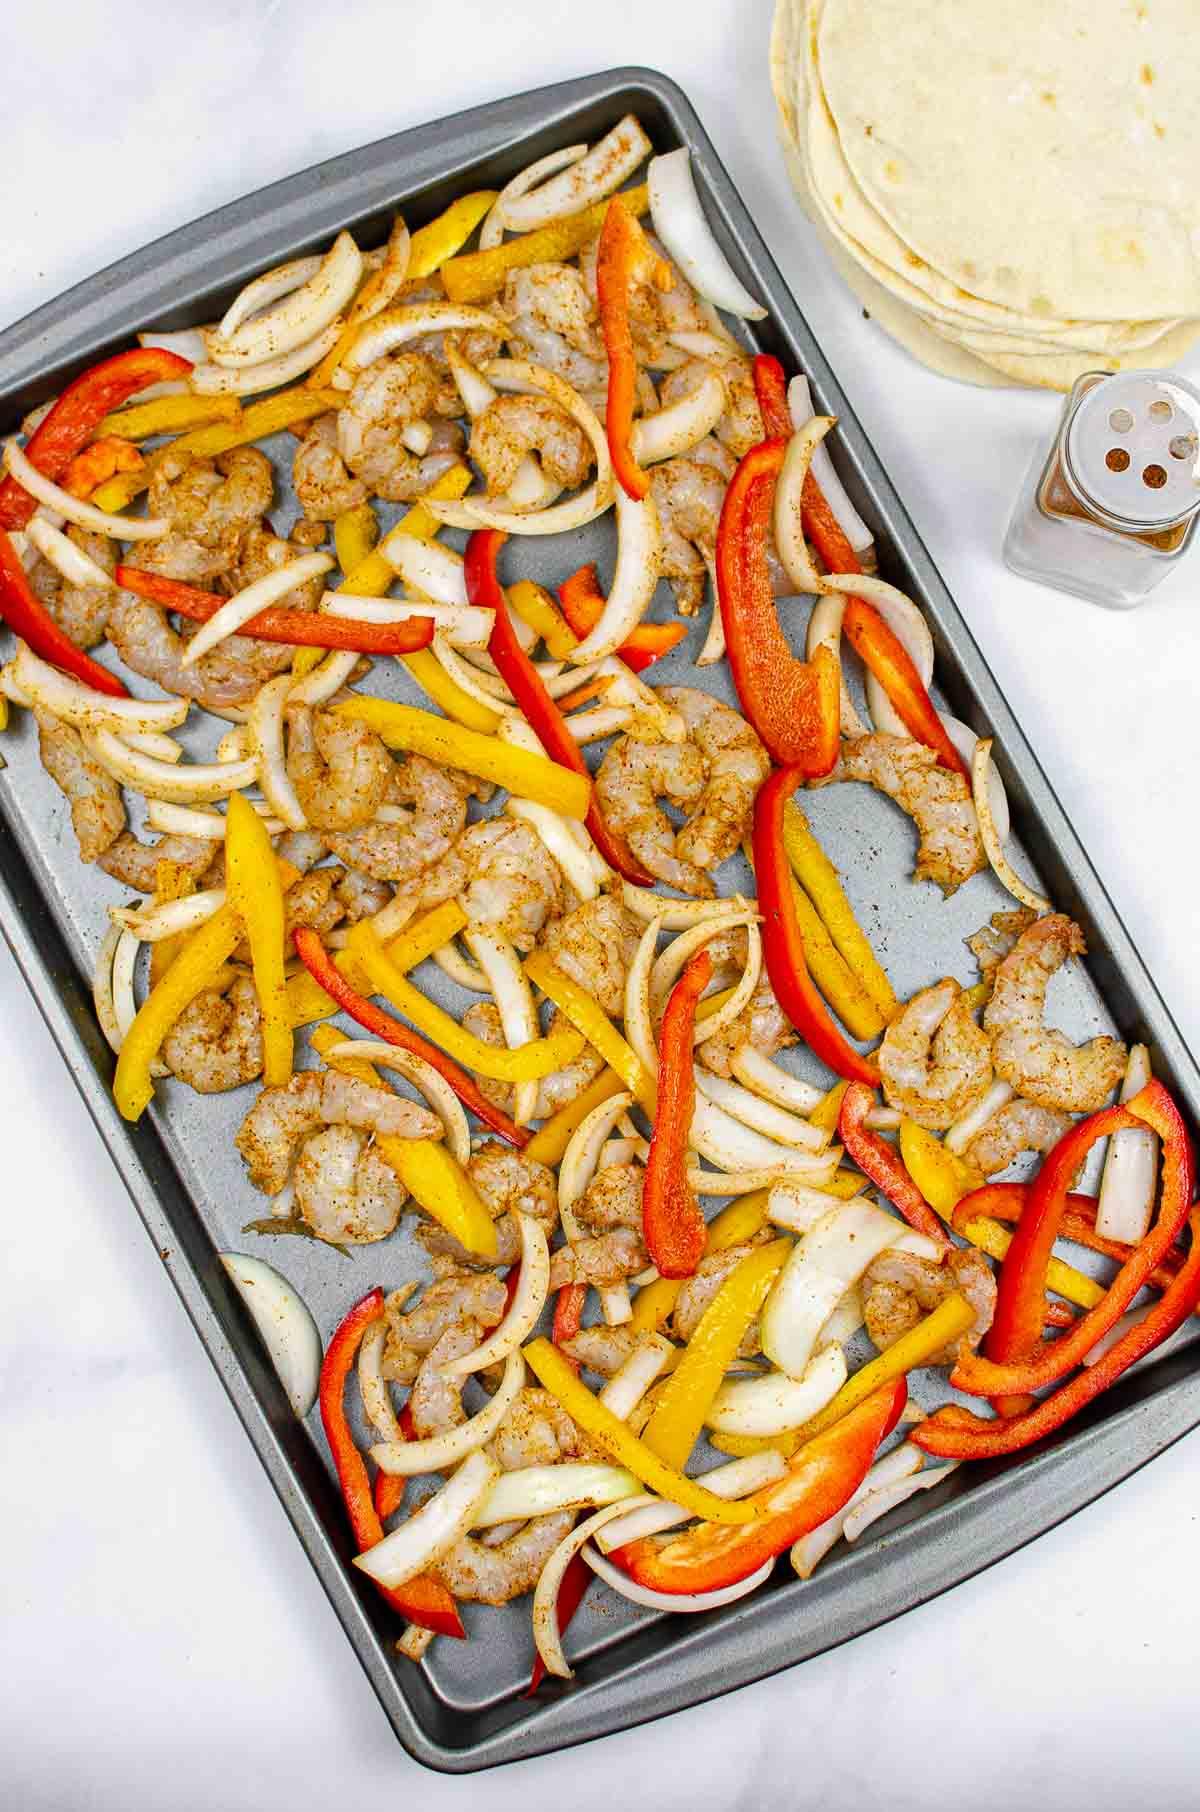 Sliced peppers, onions, and shrimp seasoned with fajita seasoning on a sheet pan.